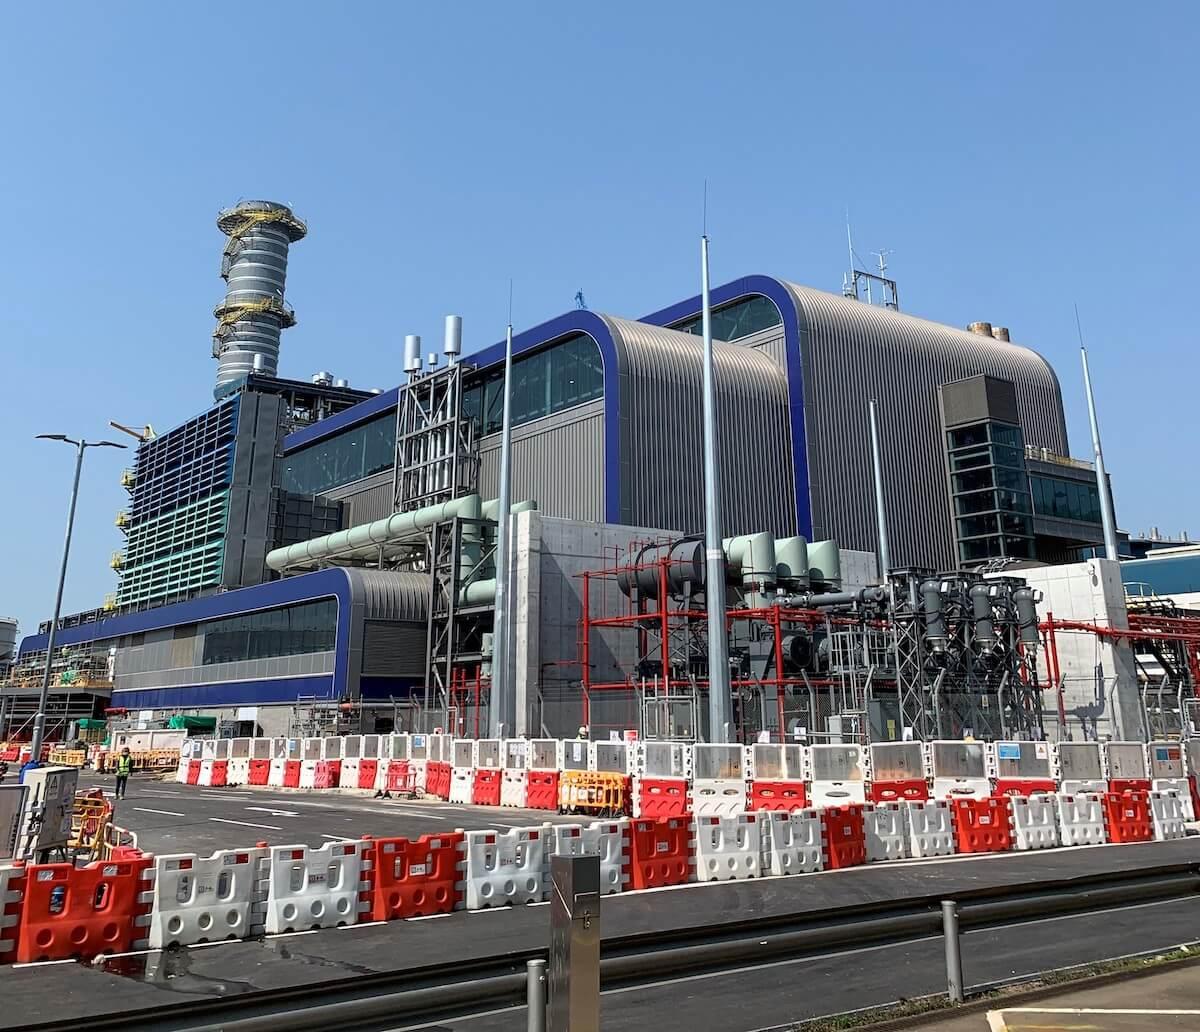 Black Point Power Station turbine hall